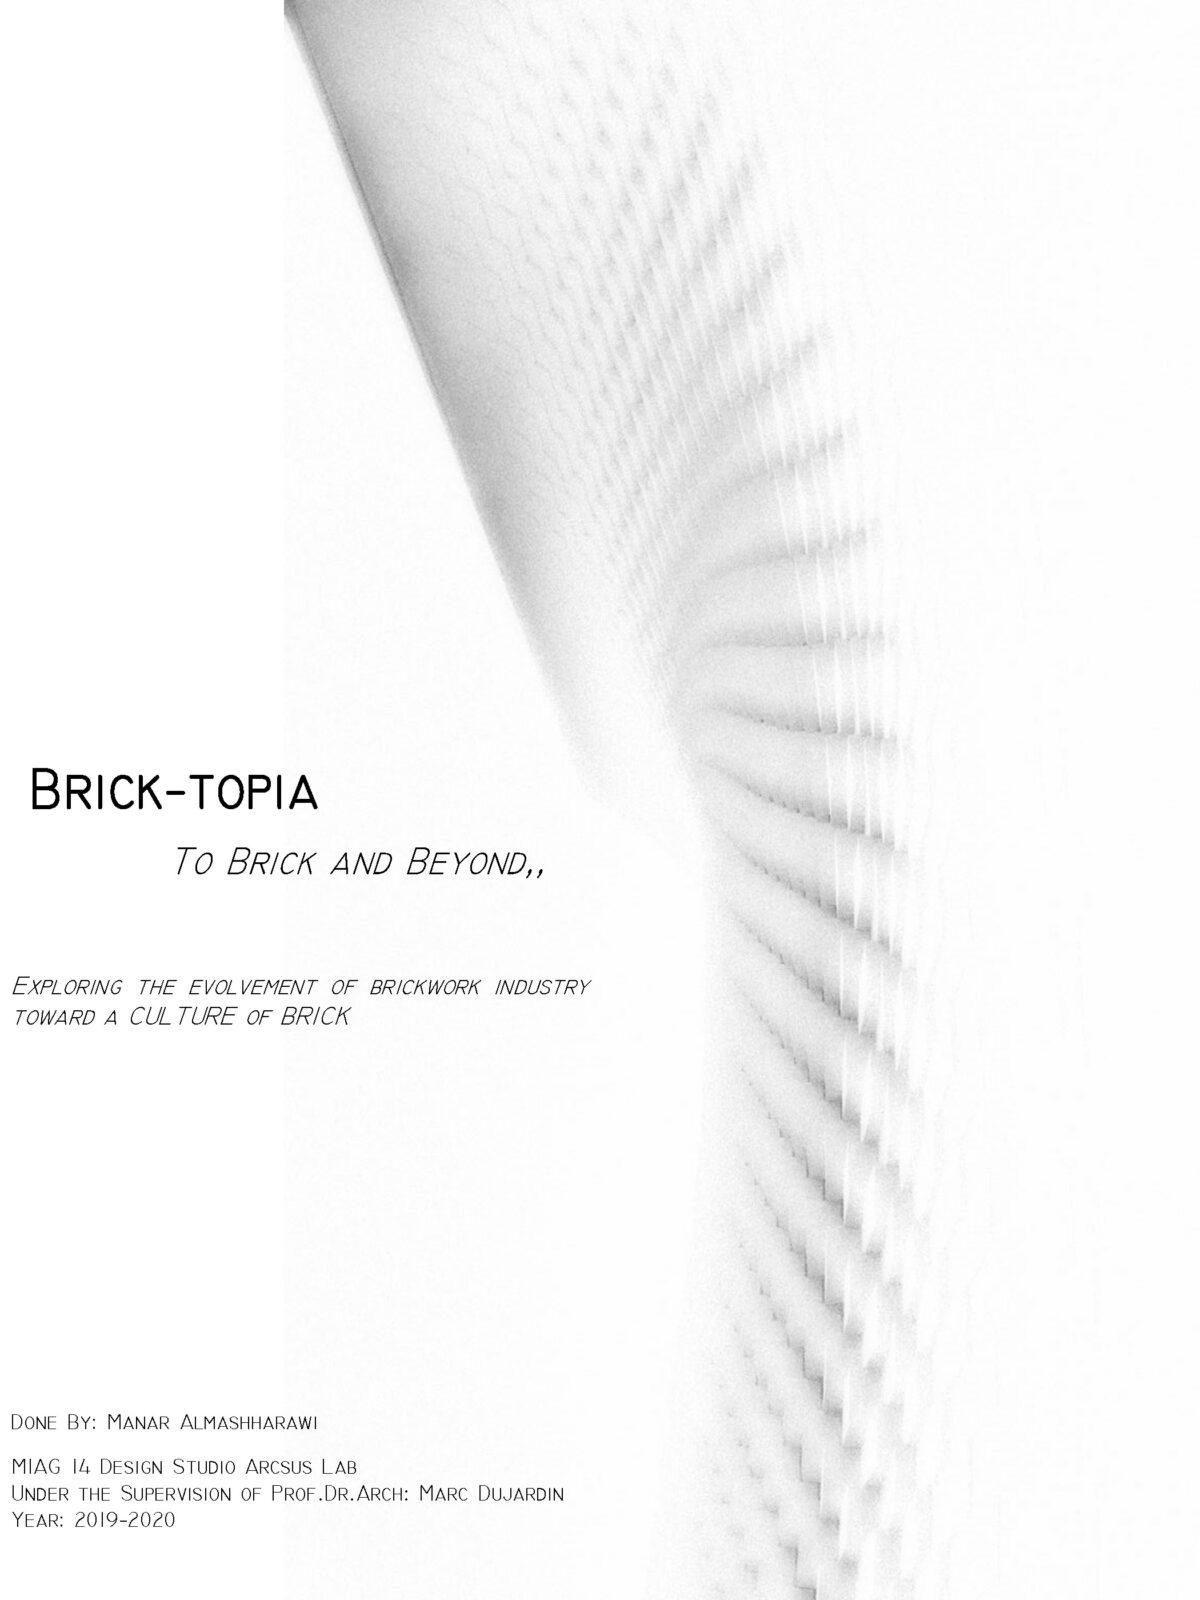 brick-topia-manar-almashharawai-leporello-maig14-2019-2020-1